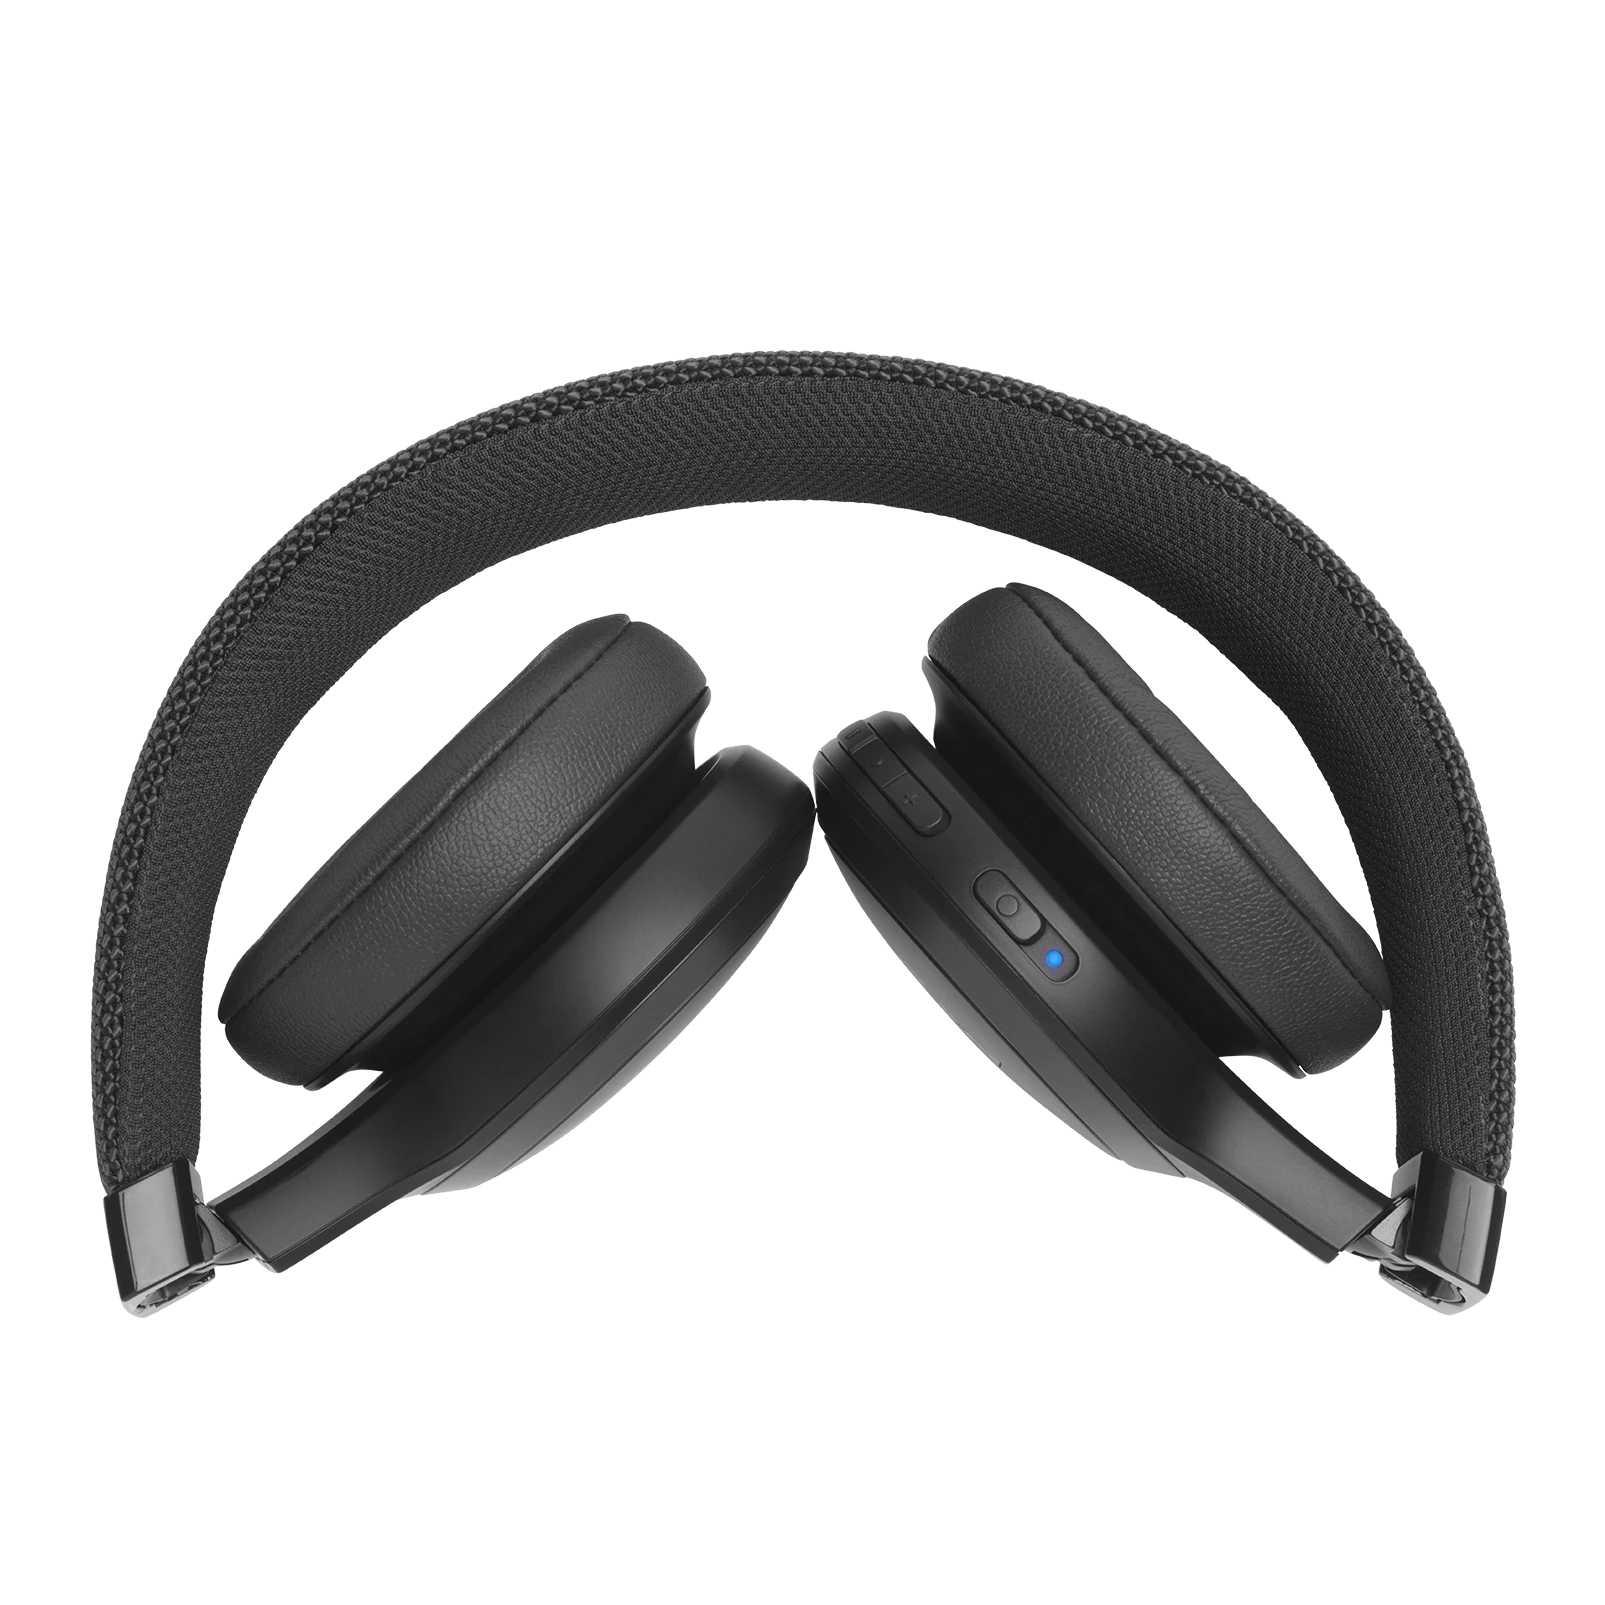 Fone de Ouvido Bluetooth JBL Live 400BT - Preto JBLLIVE400BTBLK